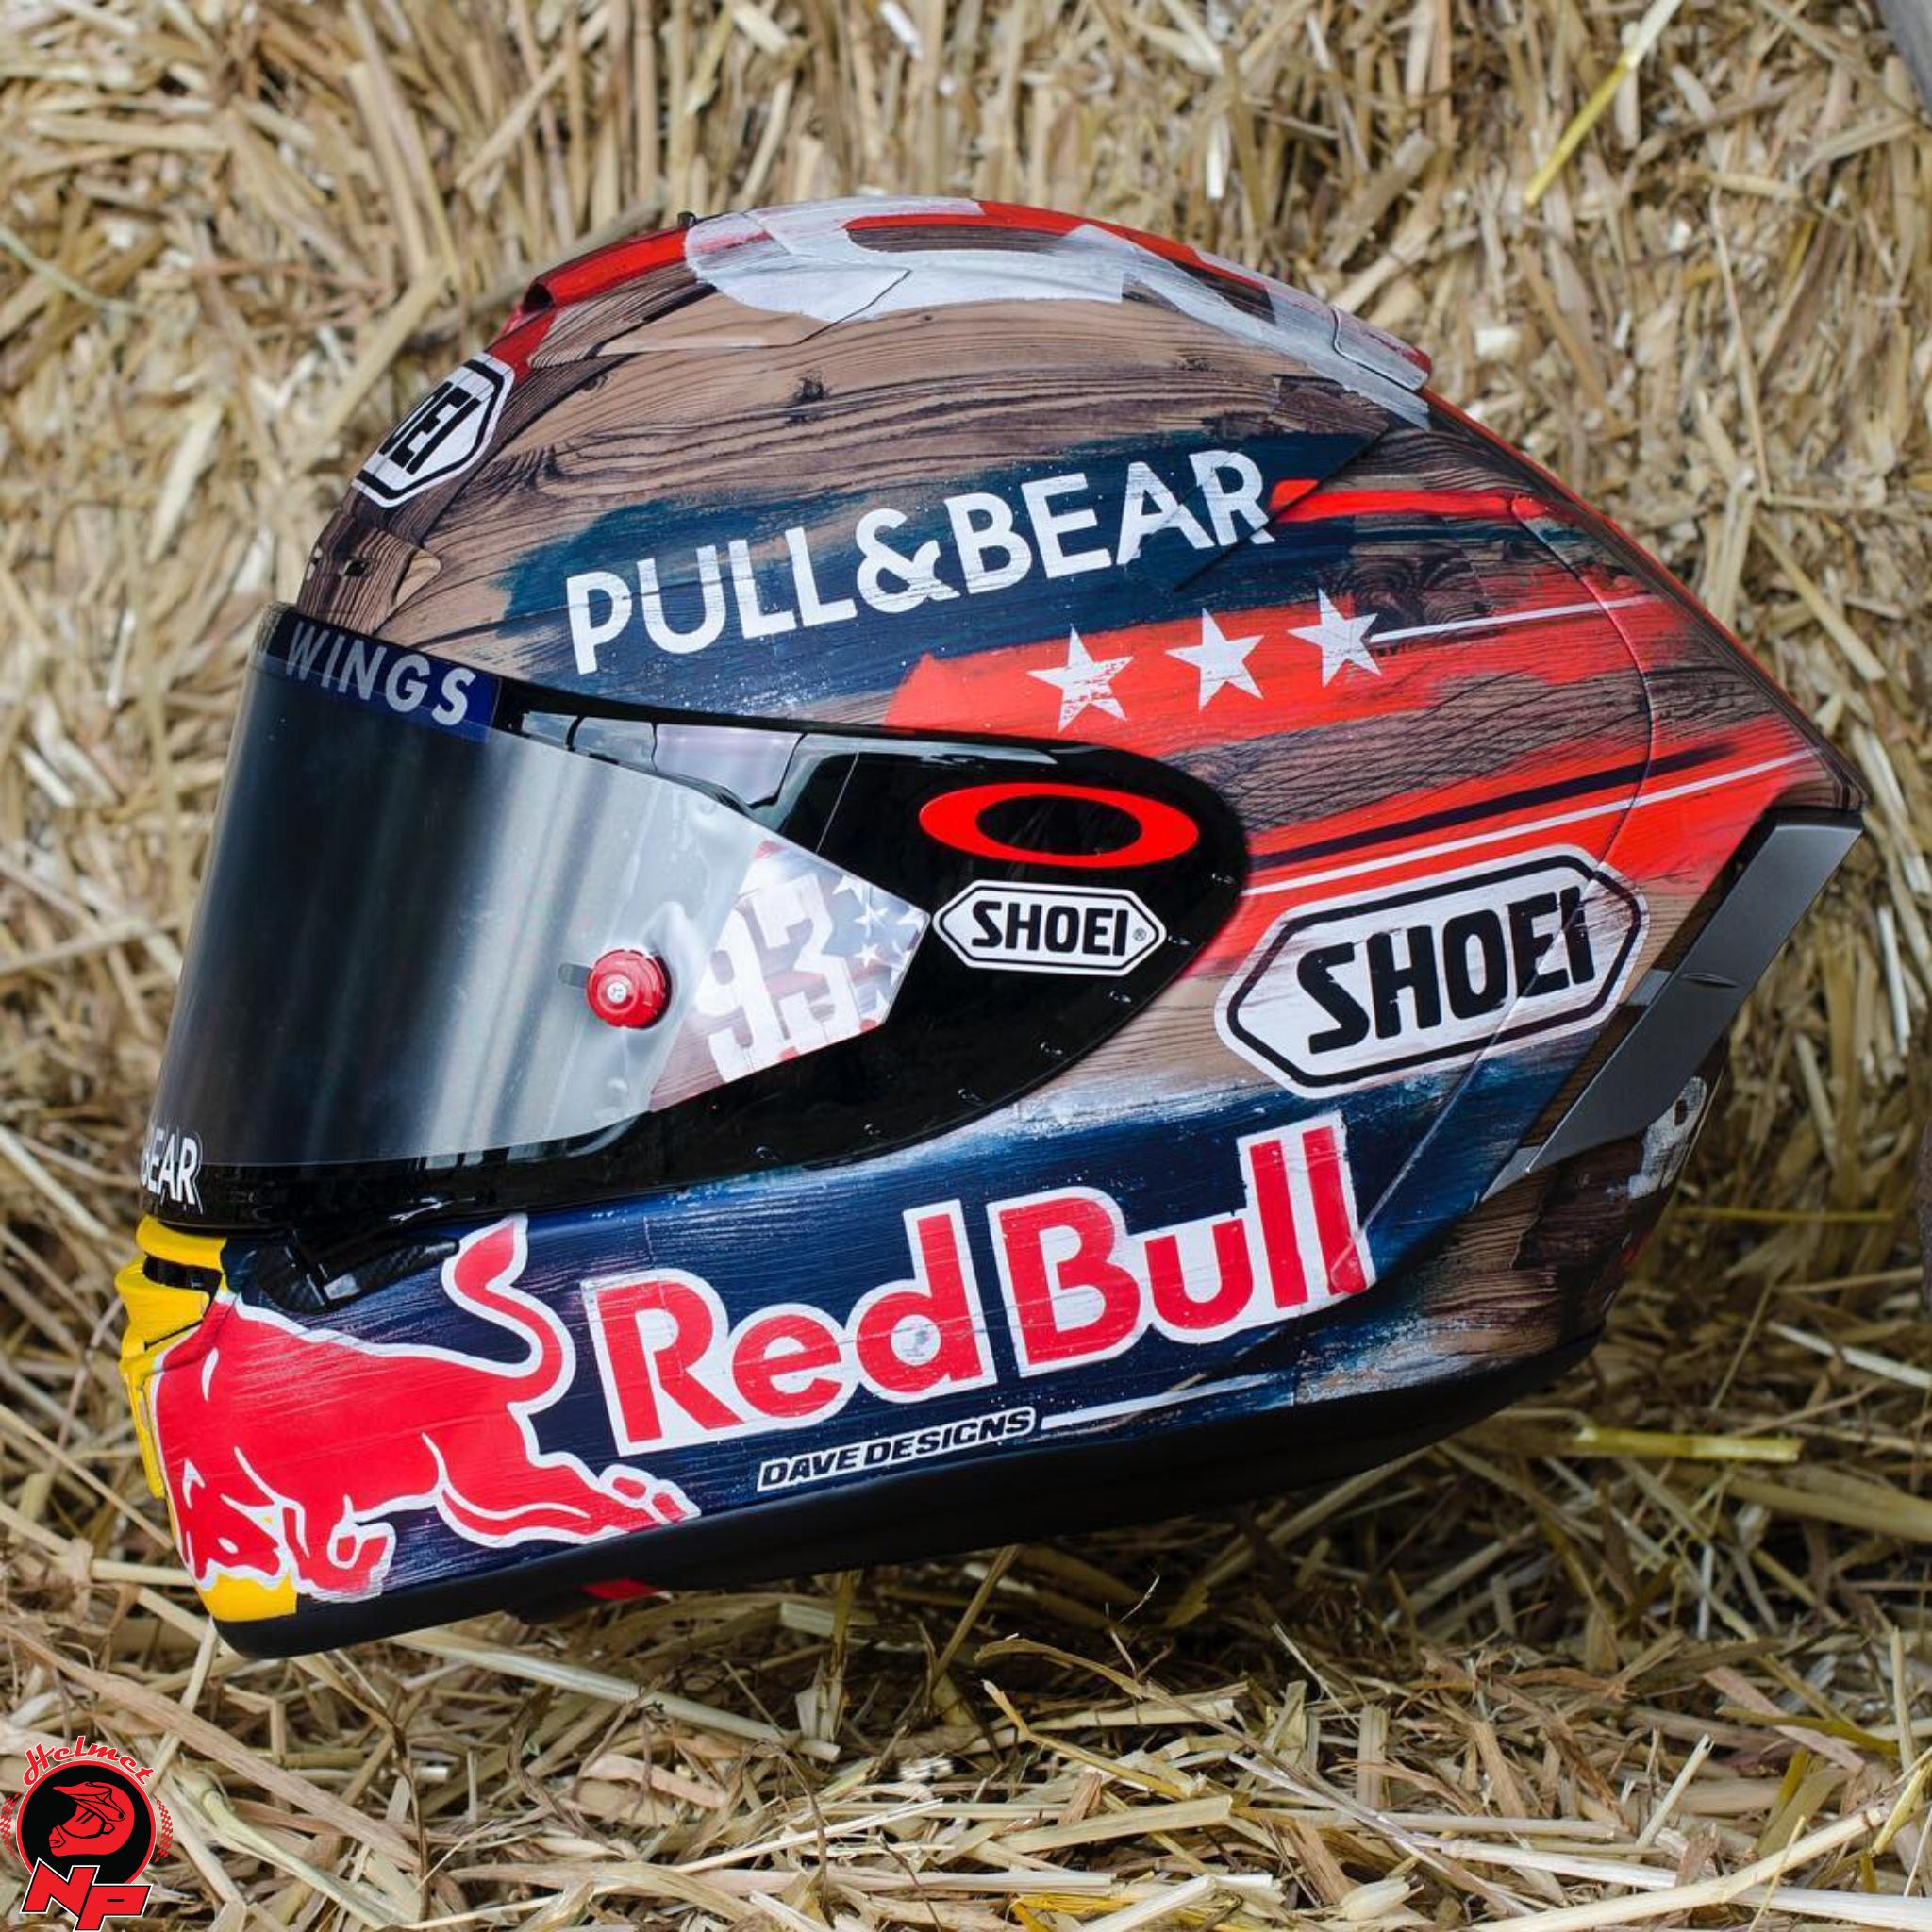 Mũ Bảo Hiểm Shoei X-Spirit 3 Marquez America Limited Edition (PRE-ORDER)